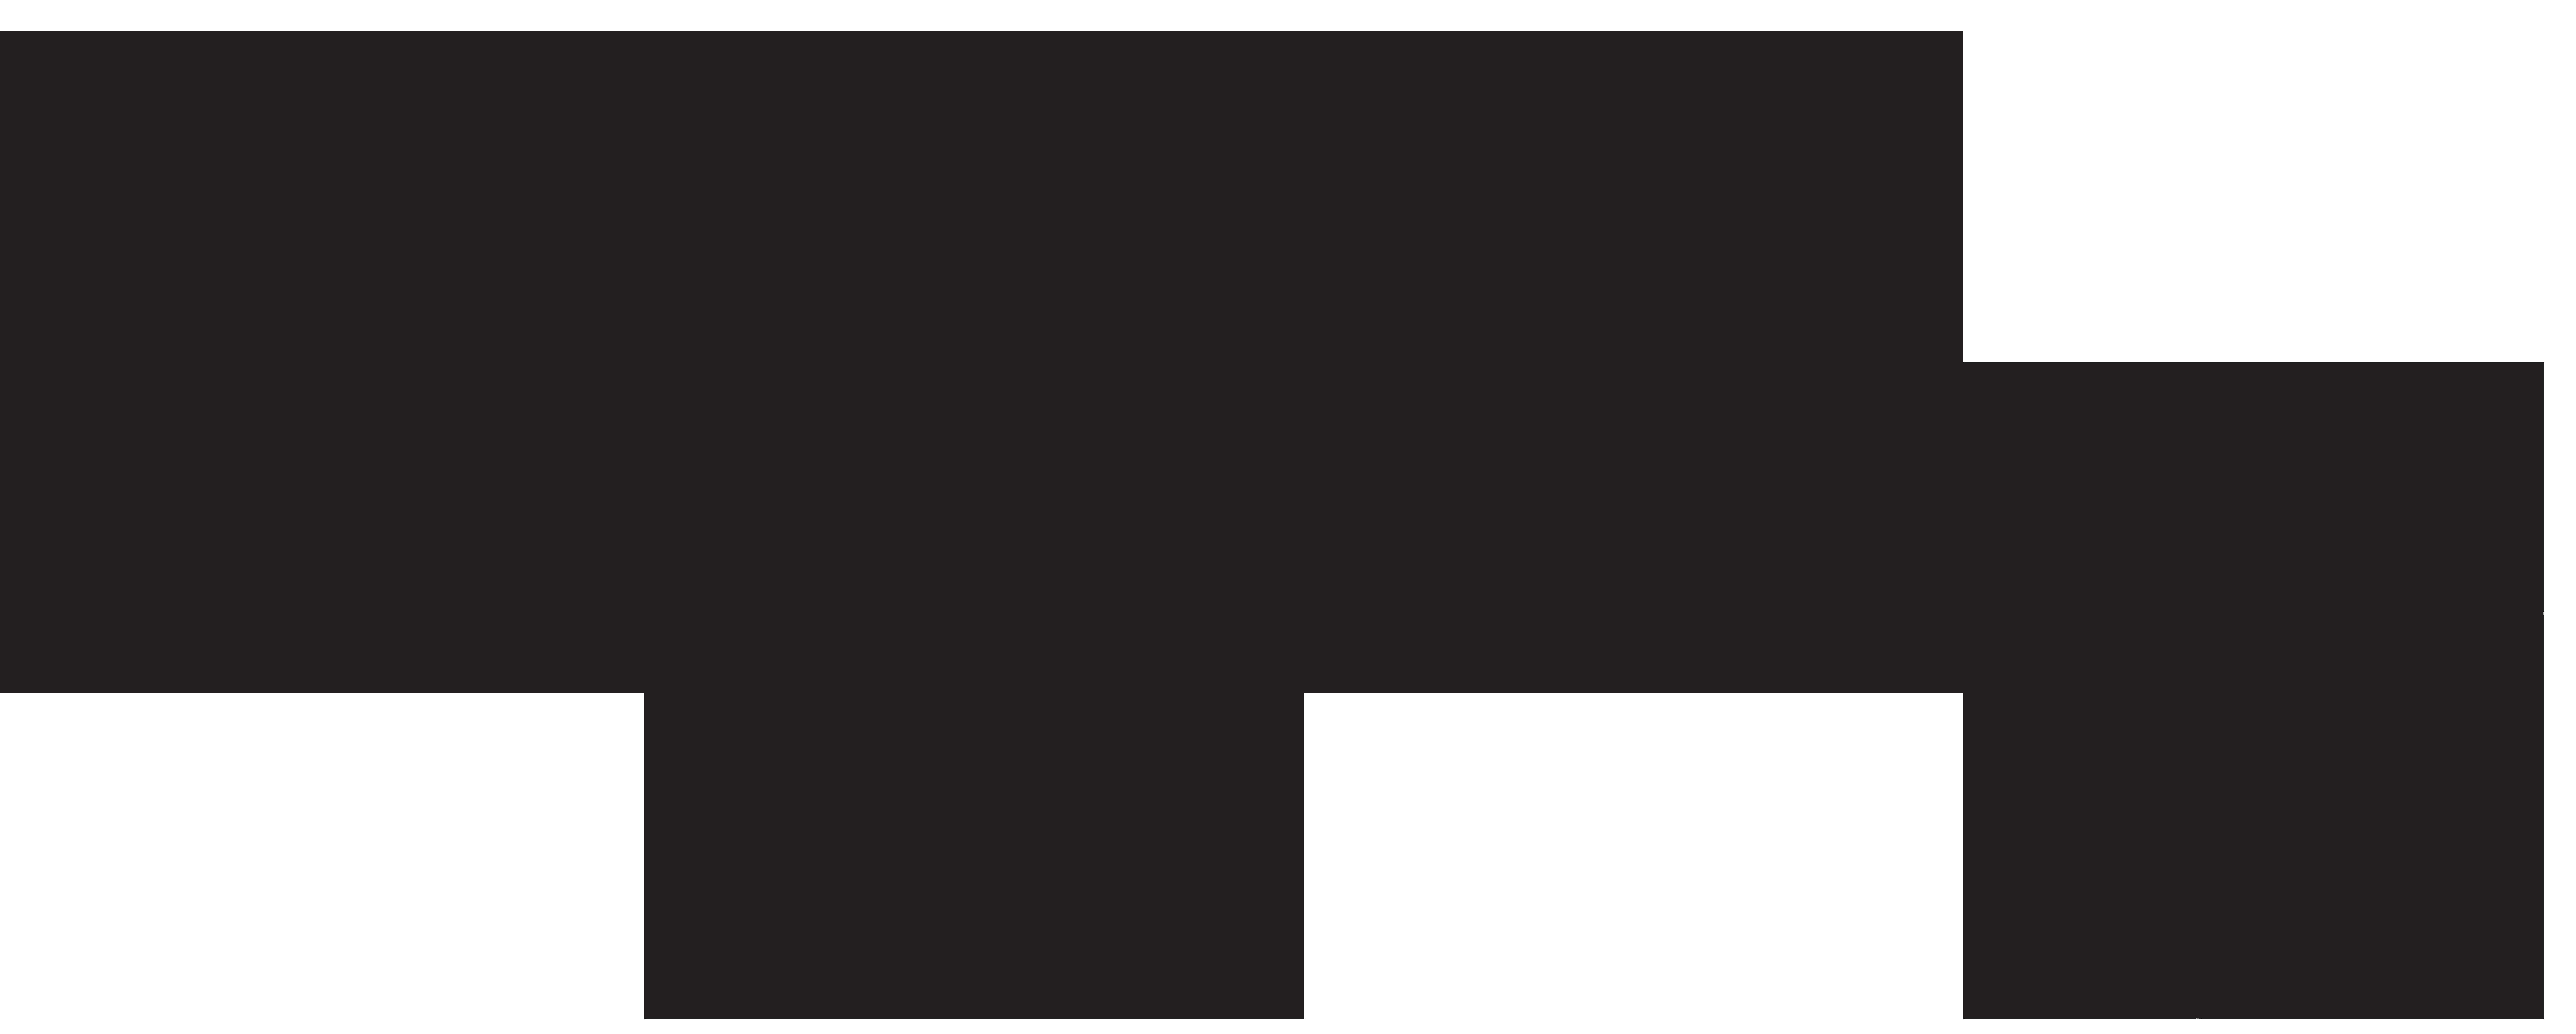 71 Views Dolphin Silhouette Silhouette Silhouette Png